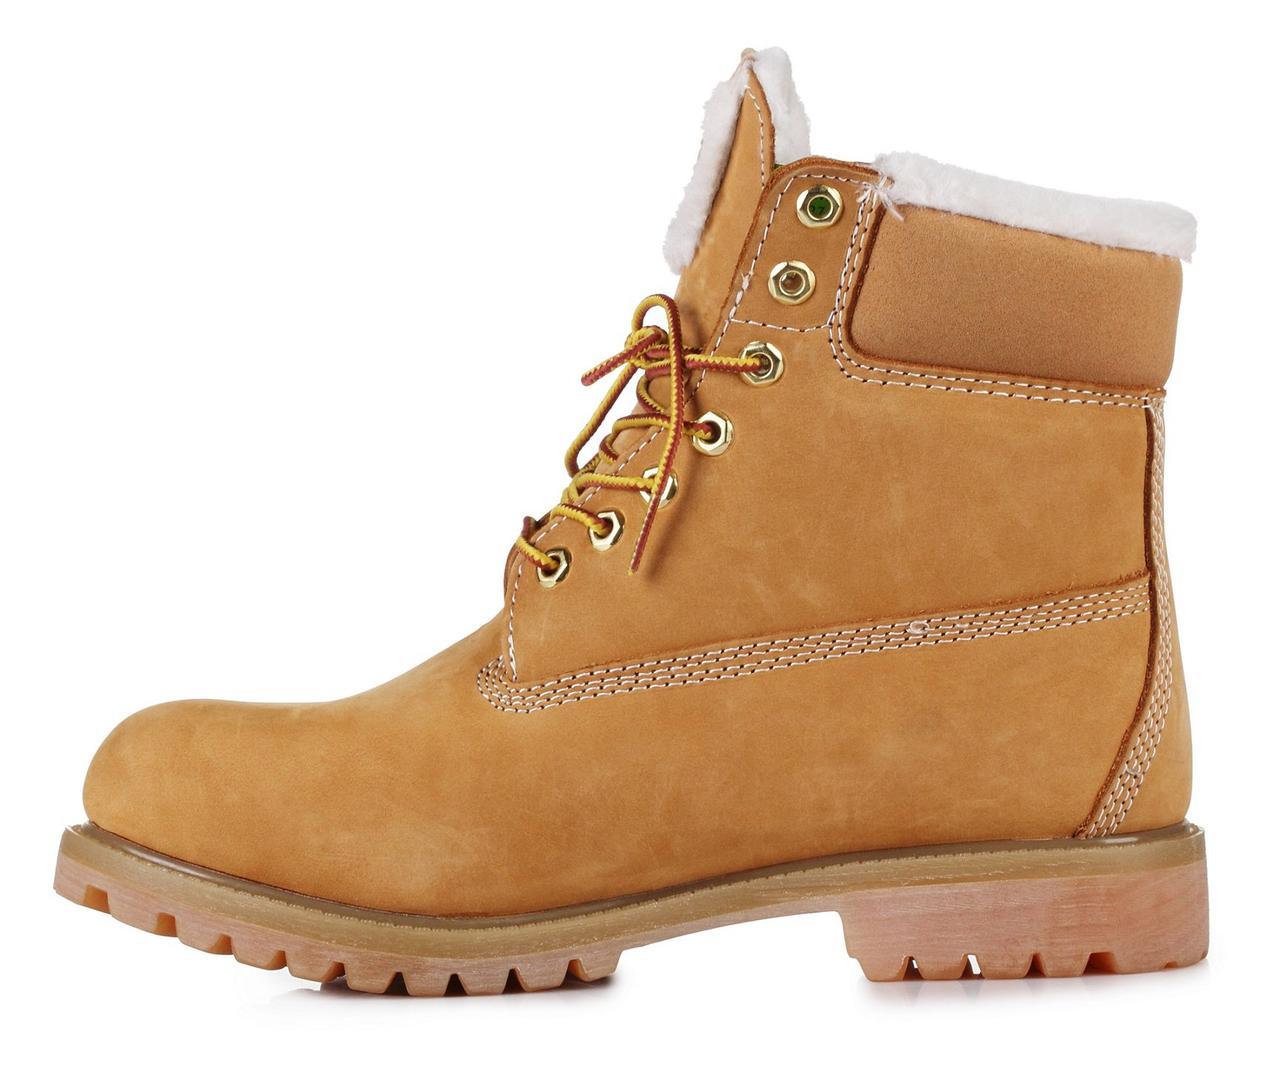 Ботинки Timberland женские Classic 6 inch Yellow Winter Fur (с мехом), ботинки Тимберленд женские - интернет-магазин обуви «Walking» в Киеве